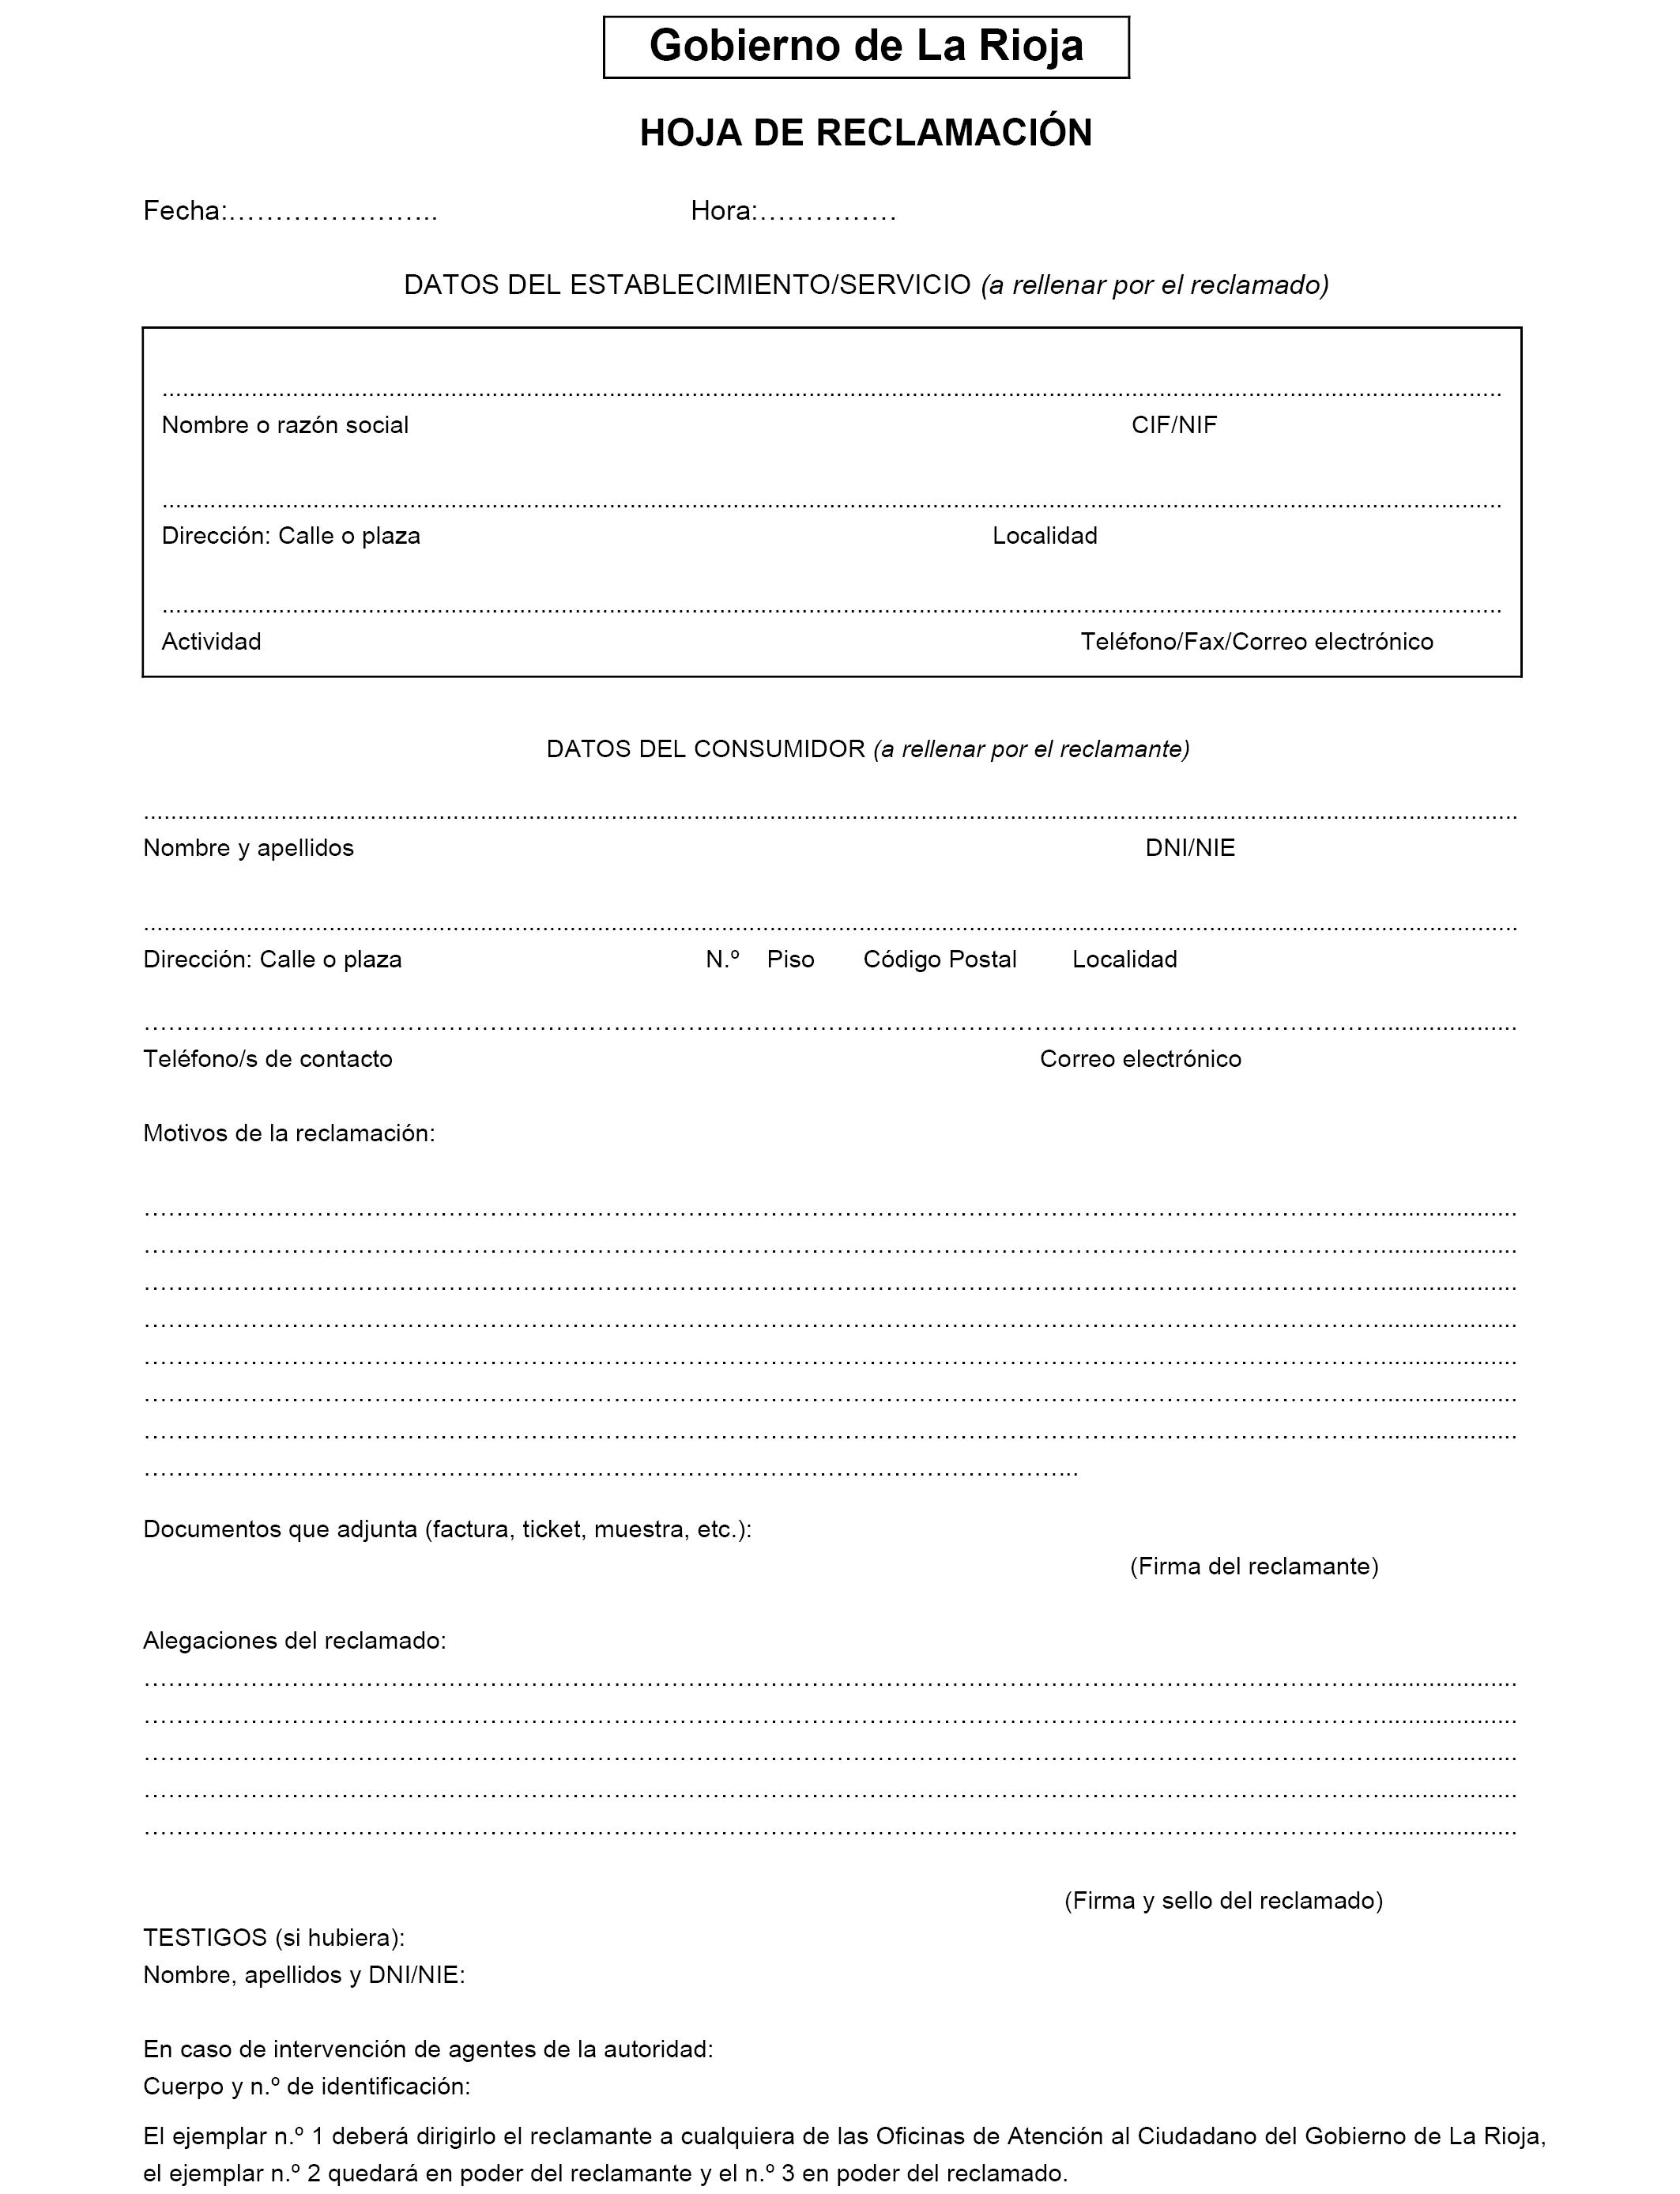 BOE.es - Documento BOE-A-2013-4464